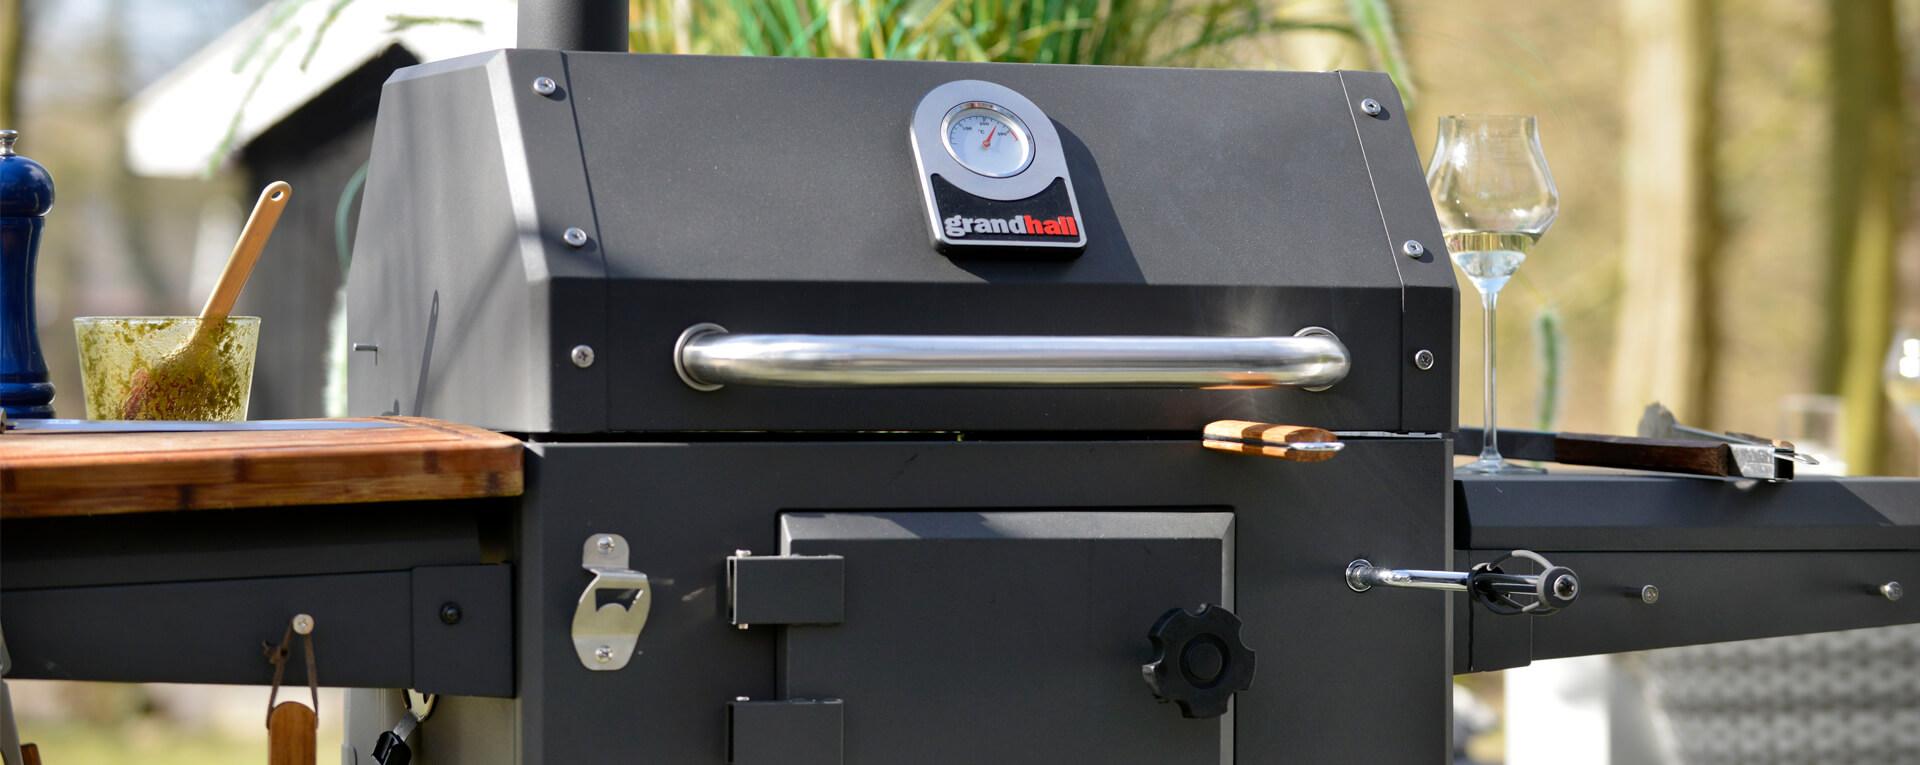 Grandhall Xenon Charcoal Gas Barbecue Tuinmeubelkorting